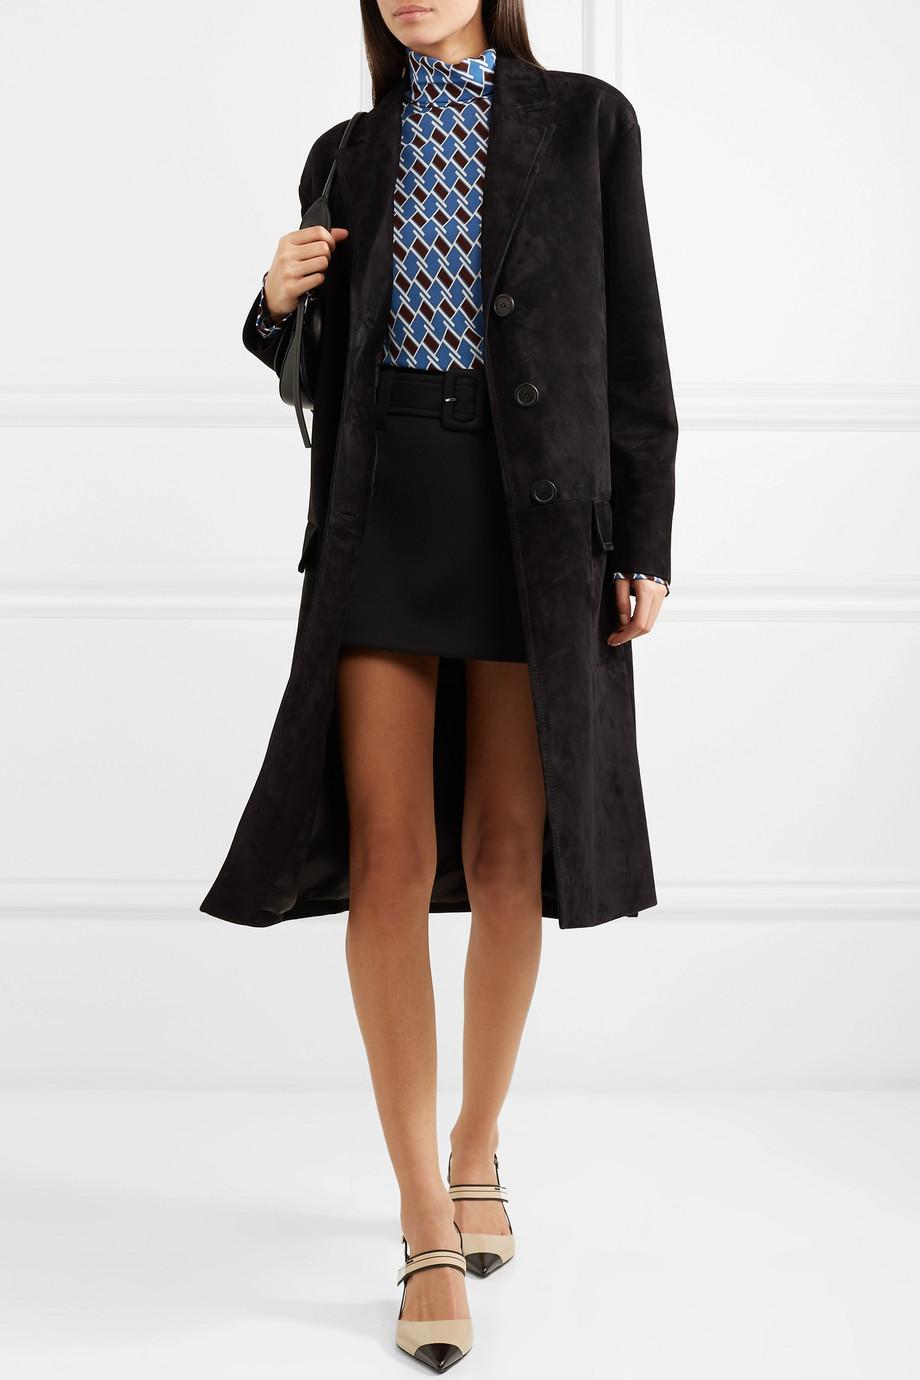 Prada Manteau en daim